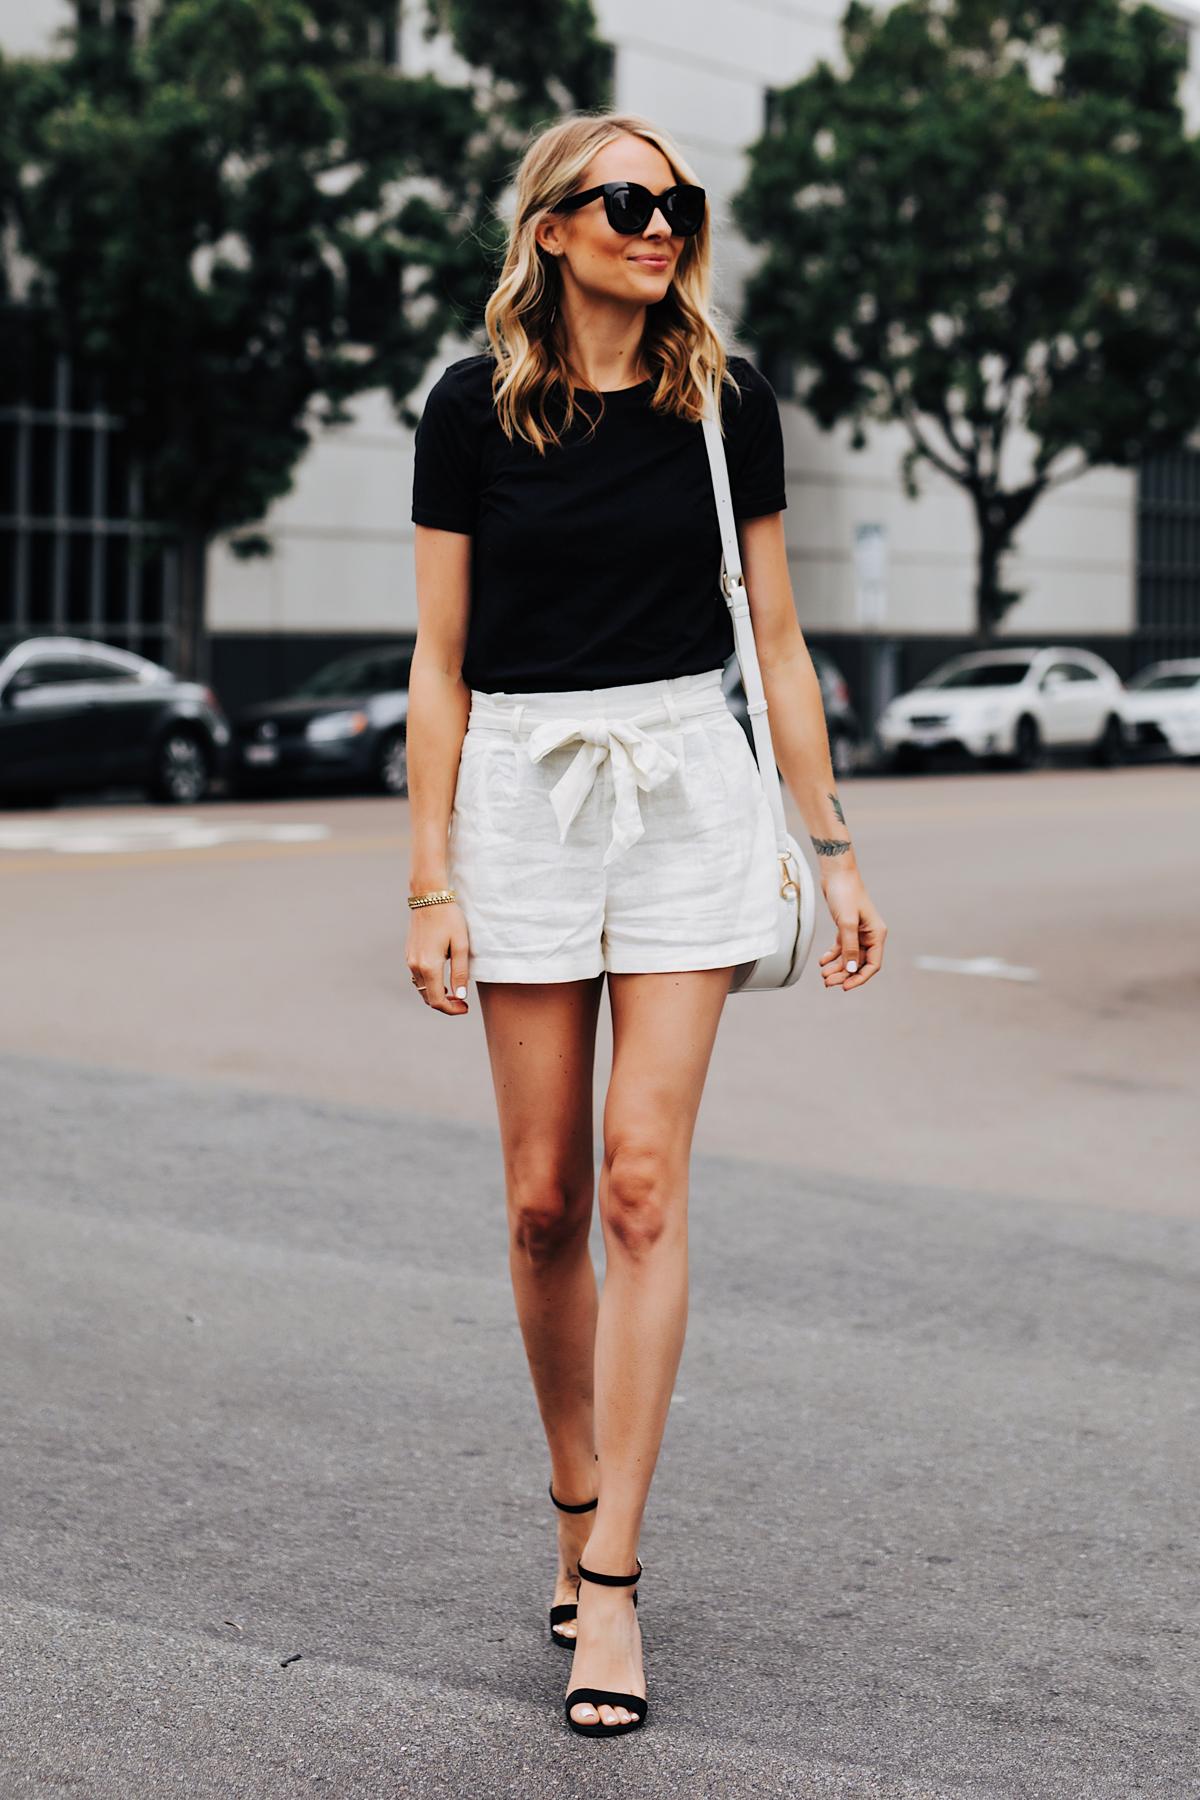 Fashion Jackson Wearing Black Tshirt White Tie Front Shorts Black Heeled Sandals